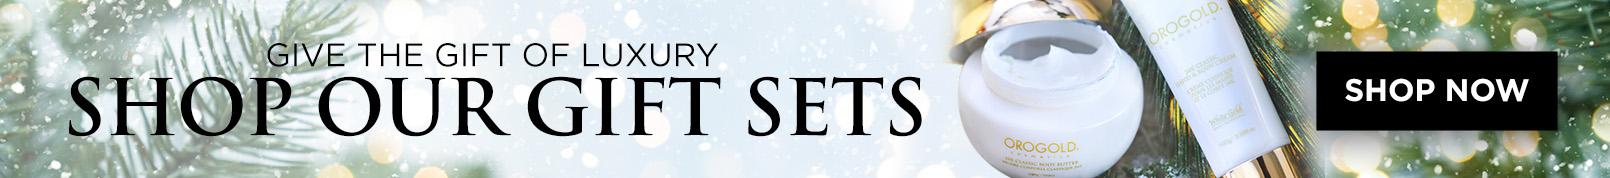 Gift Set Ad 1